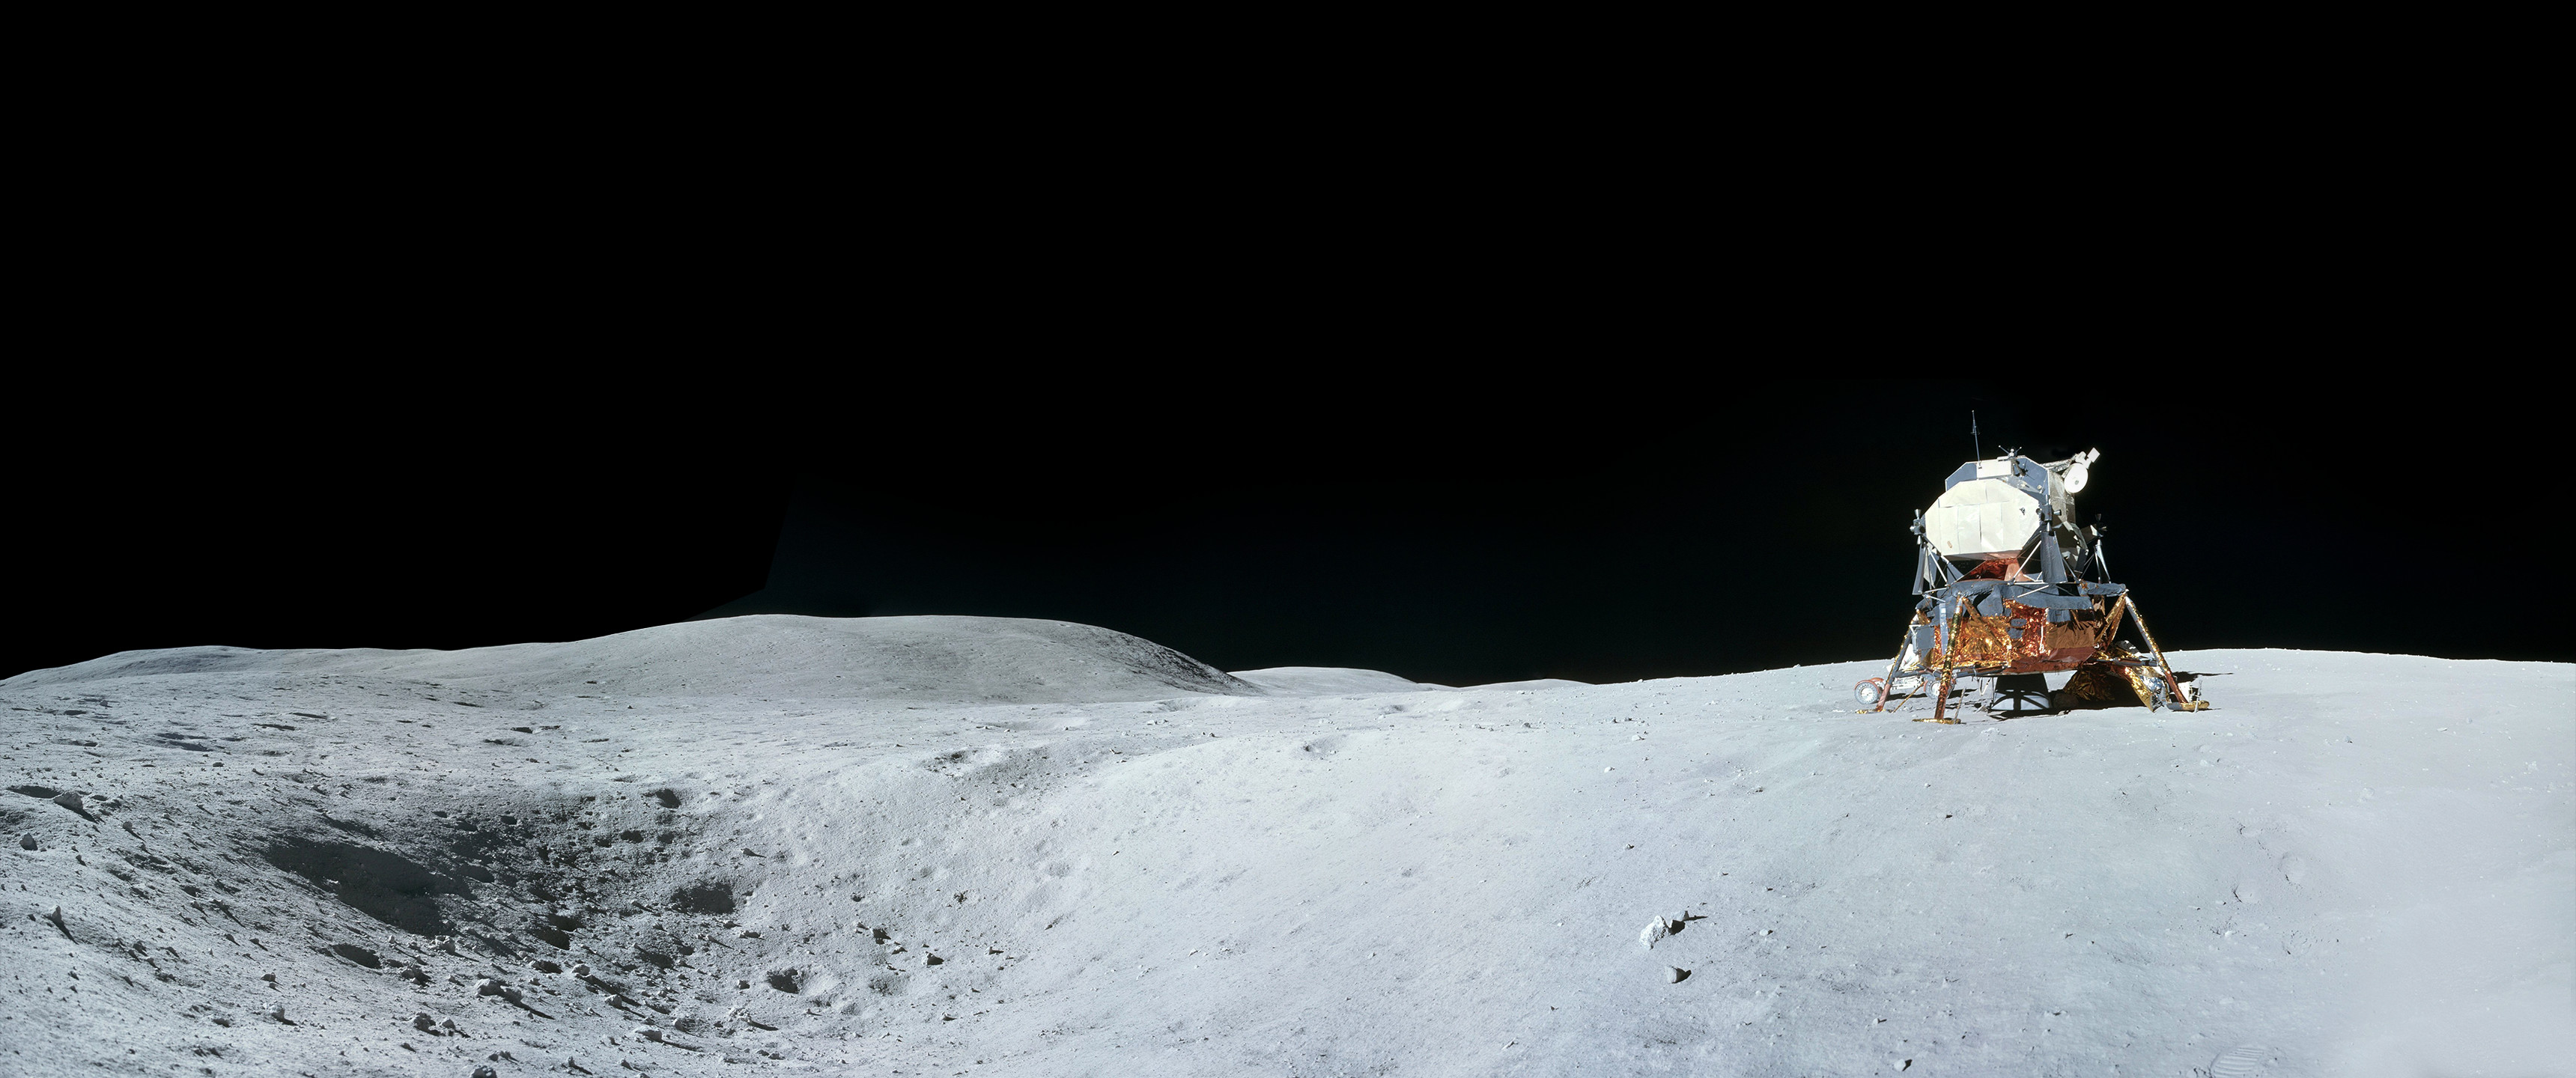 Lunar (8) by StArL0rd84 on DeviantArt